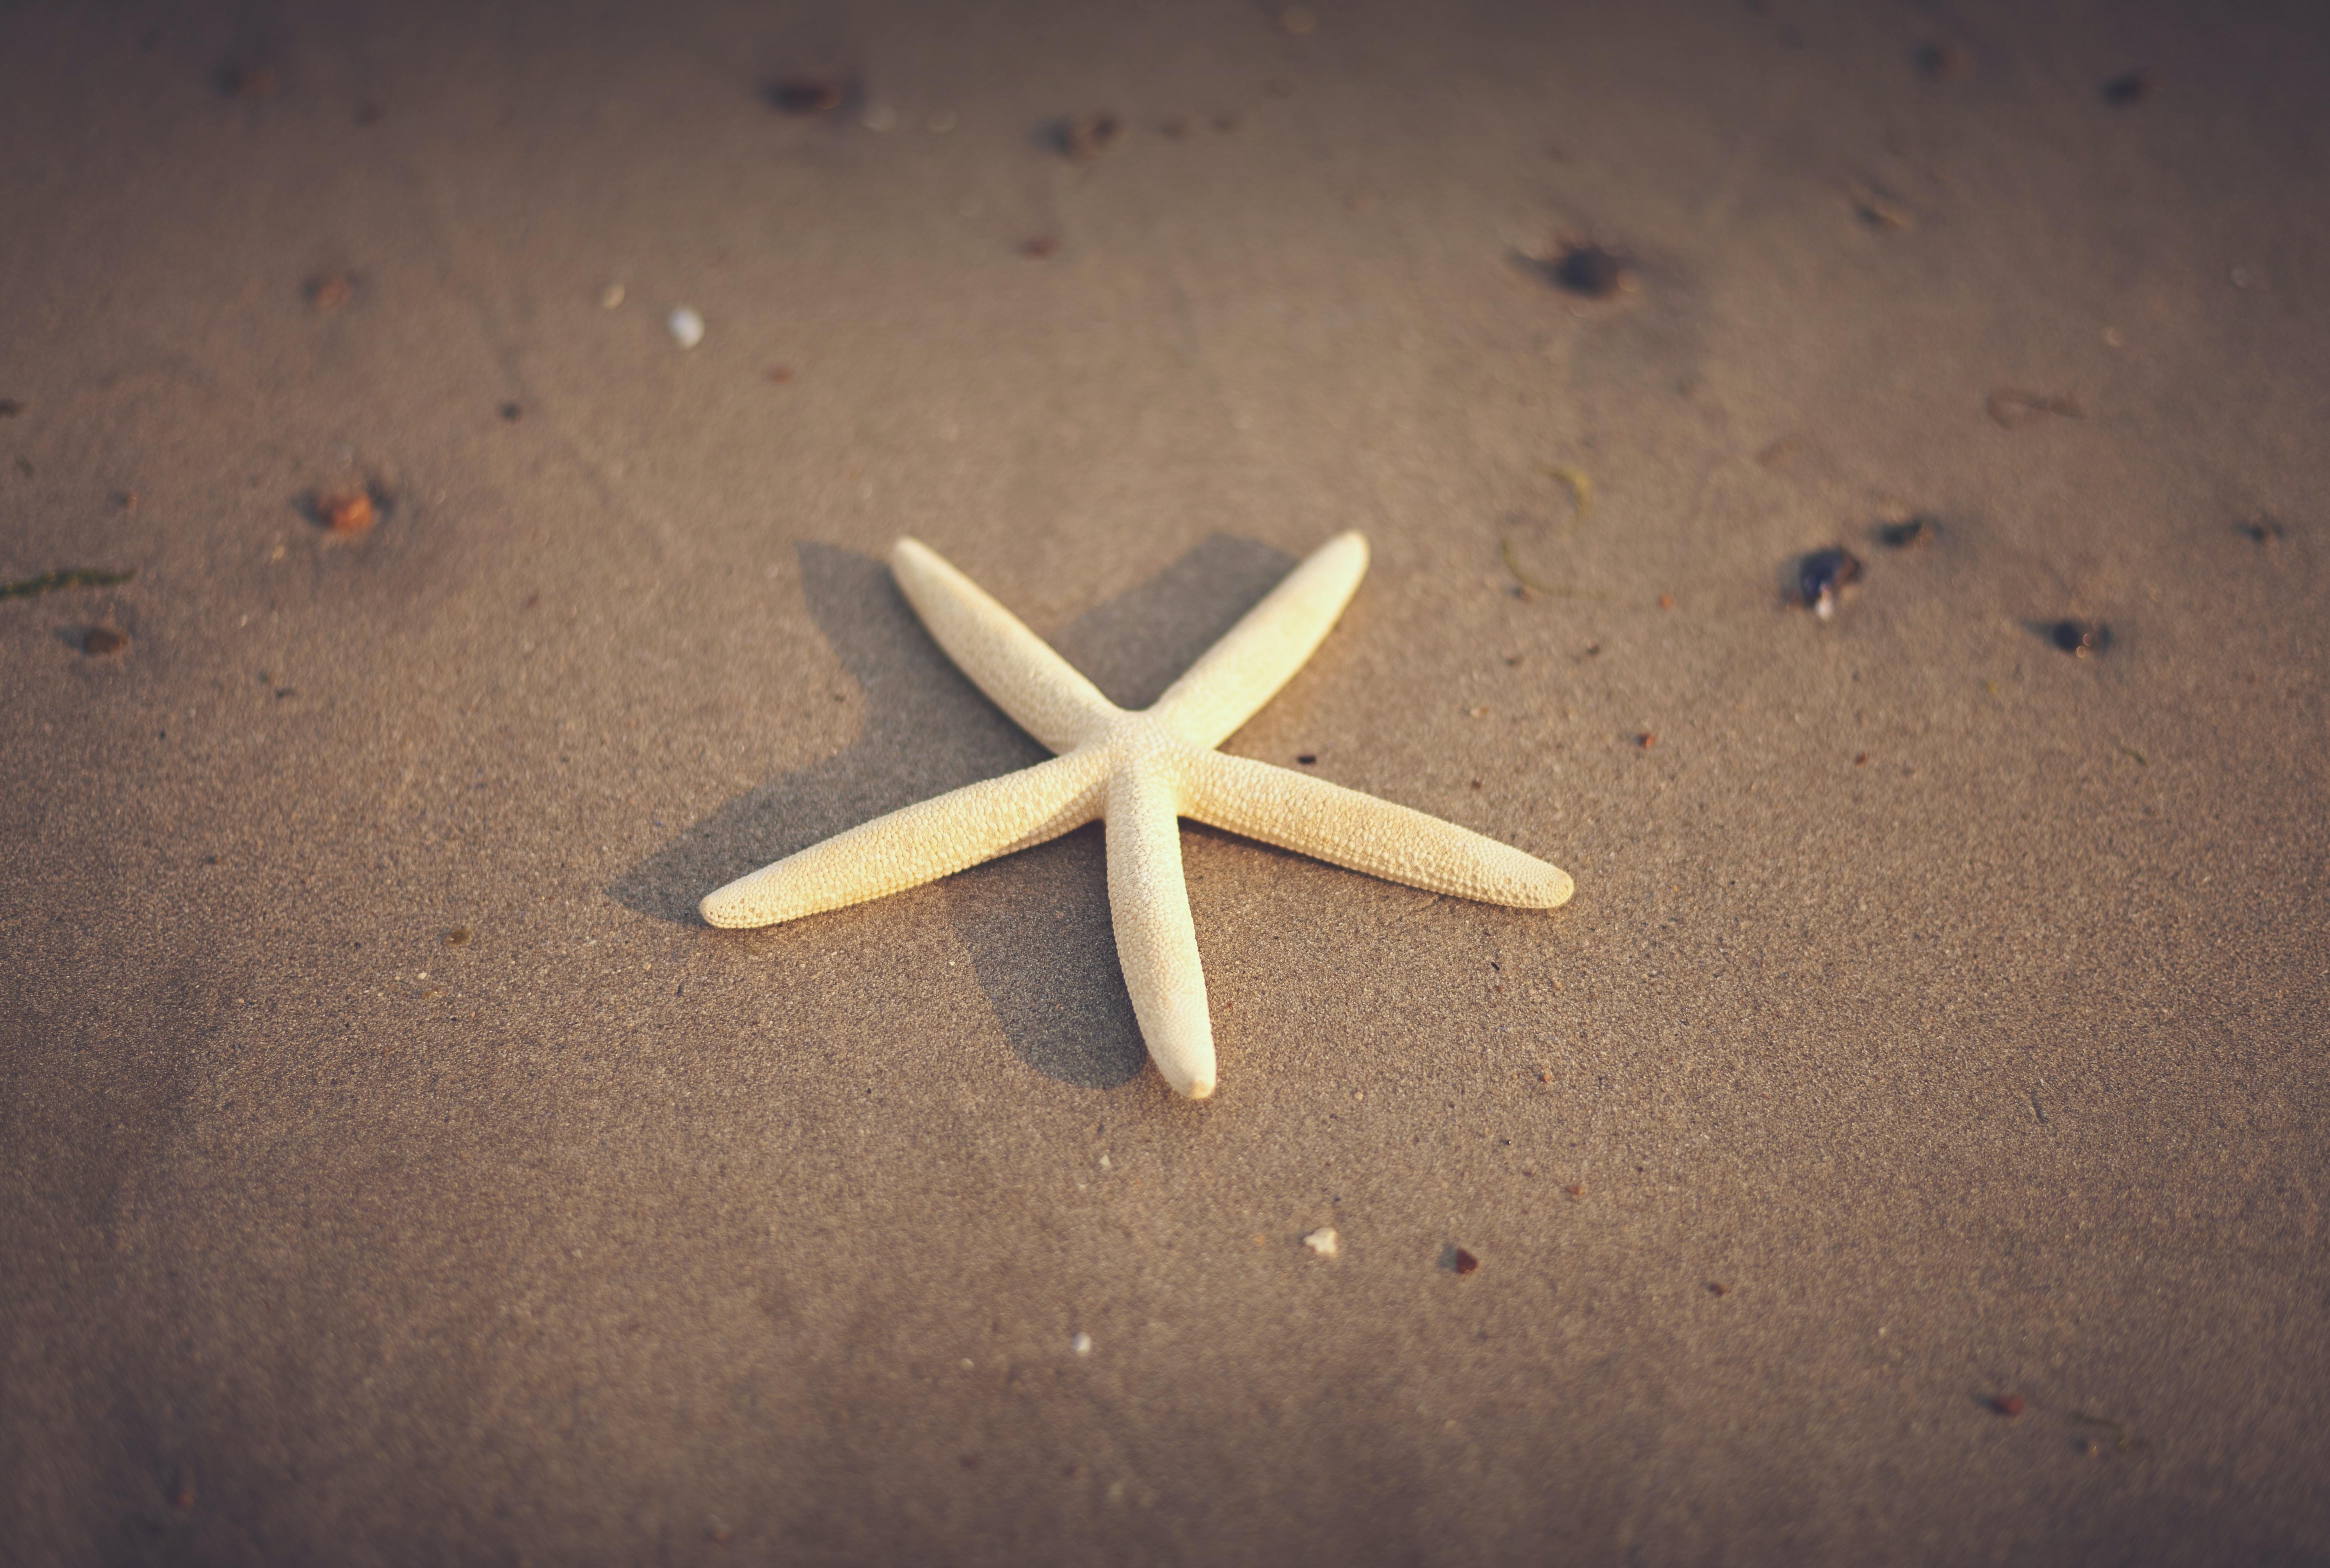 Light yellow starfish on the sand beach in Ireland